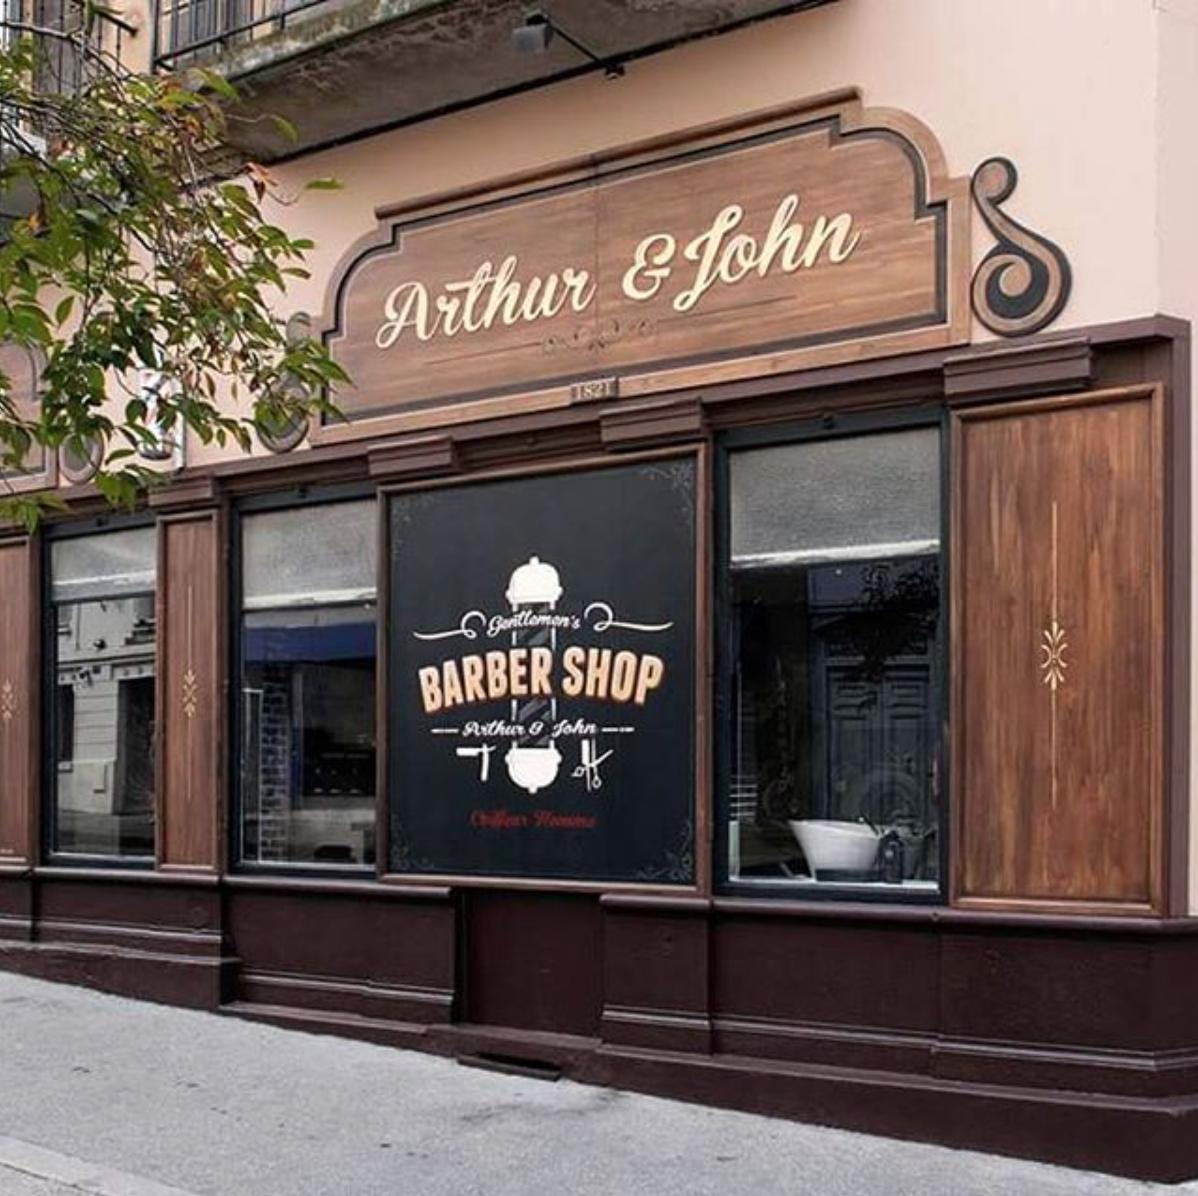 arthur & John barber shop saint-etienne